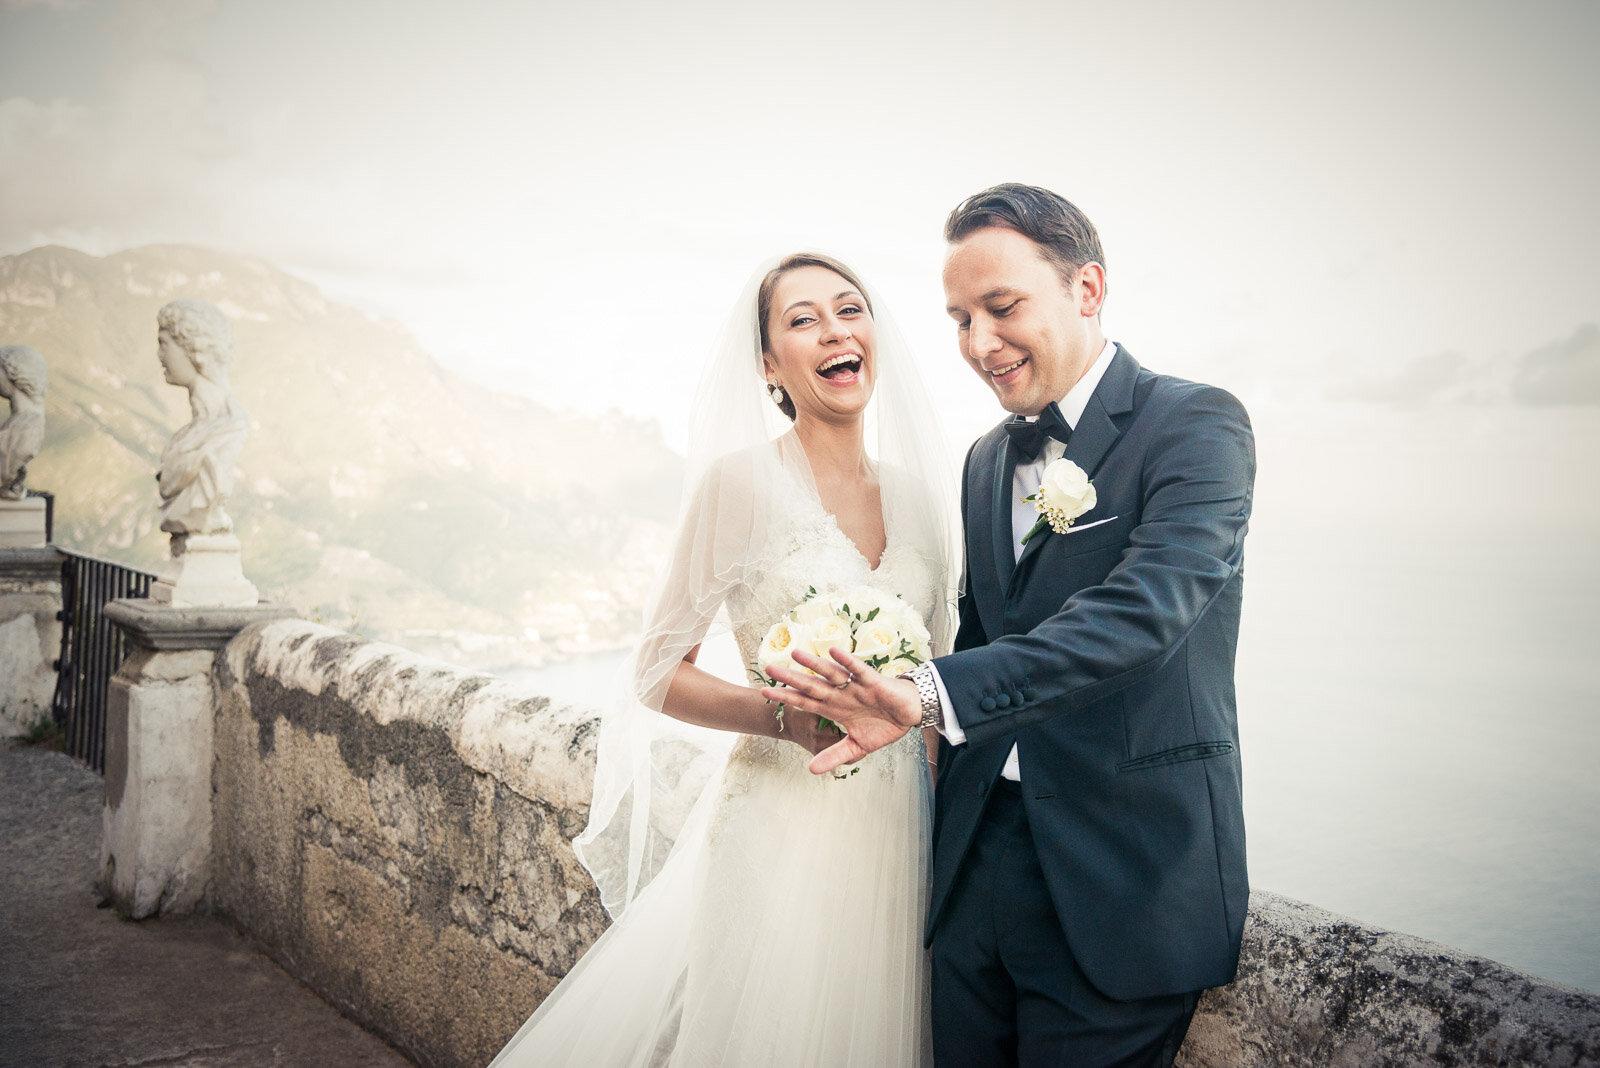 Russian Wedding in Villa Cimbrone Costiera Amalfitana 16.jpg